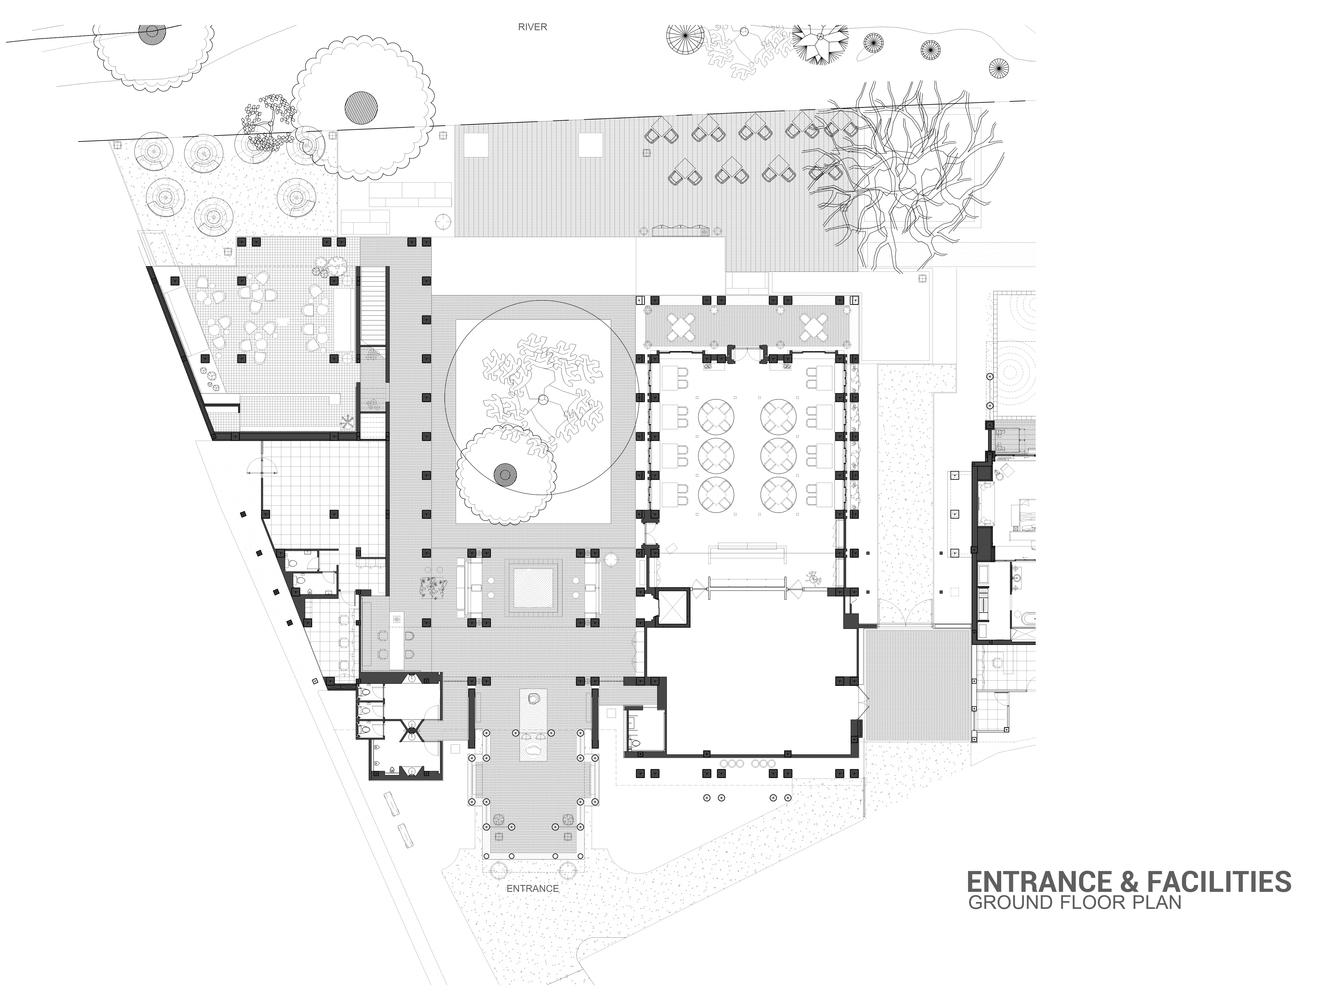 Gallery Of Raya Heritage Hotel Boondesign 37